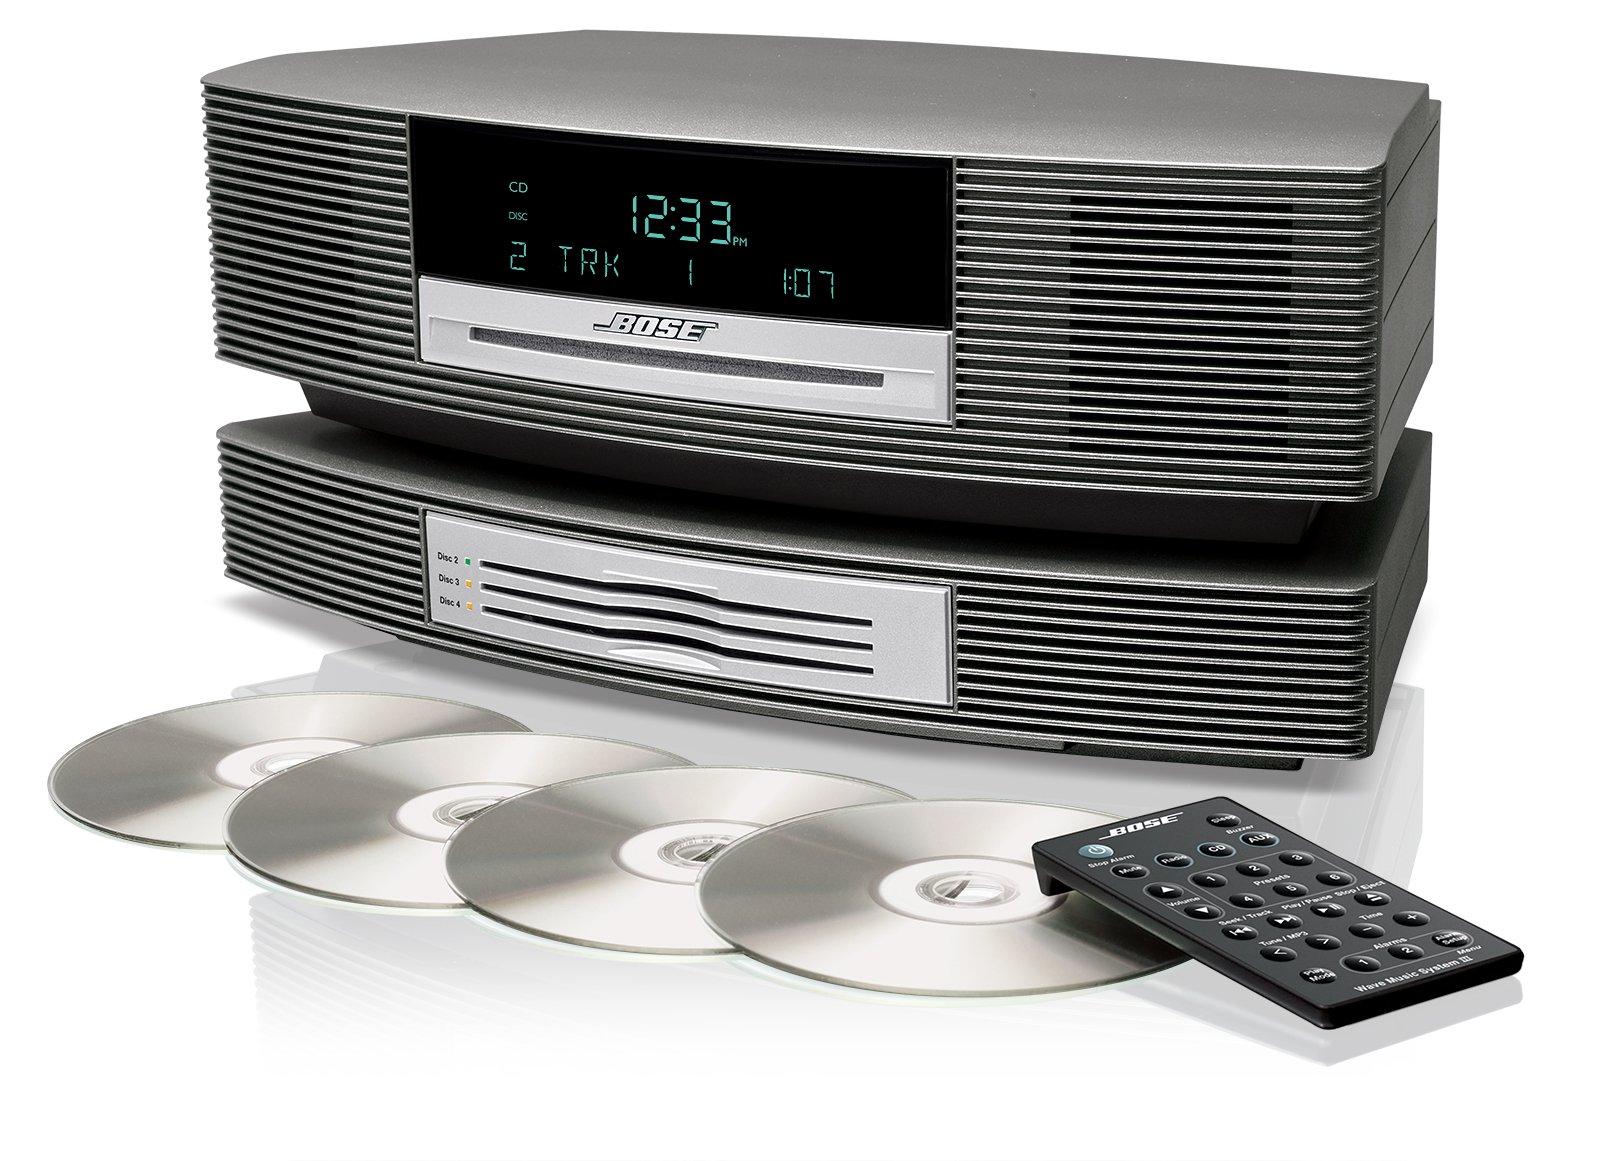 amazon com wave music system iii with multi cd changer titanium rh amazon com Bose Wave CD Changer Bose 3 CD Changer Repair